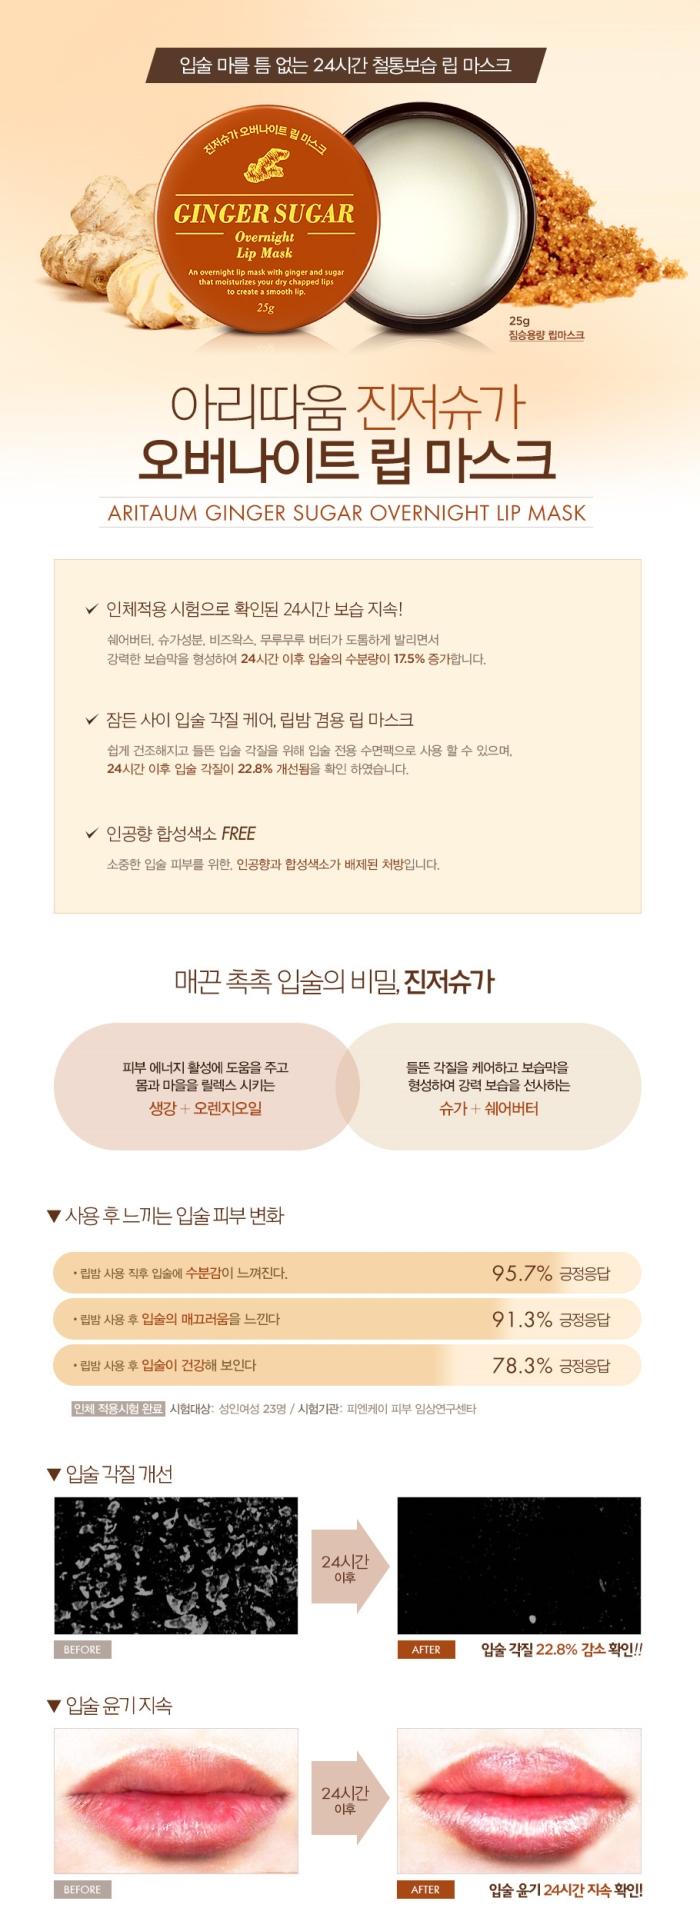 Aritaum Ginger Sugar Overnight Sugar Overnight Lip Mask (Info - Korea)